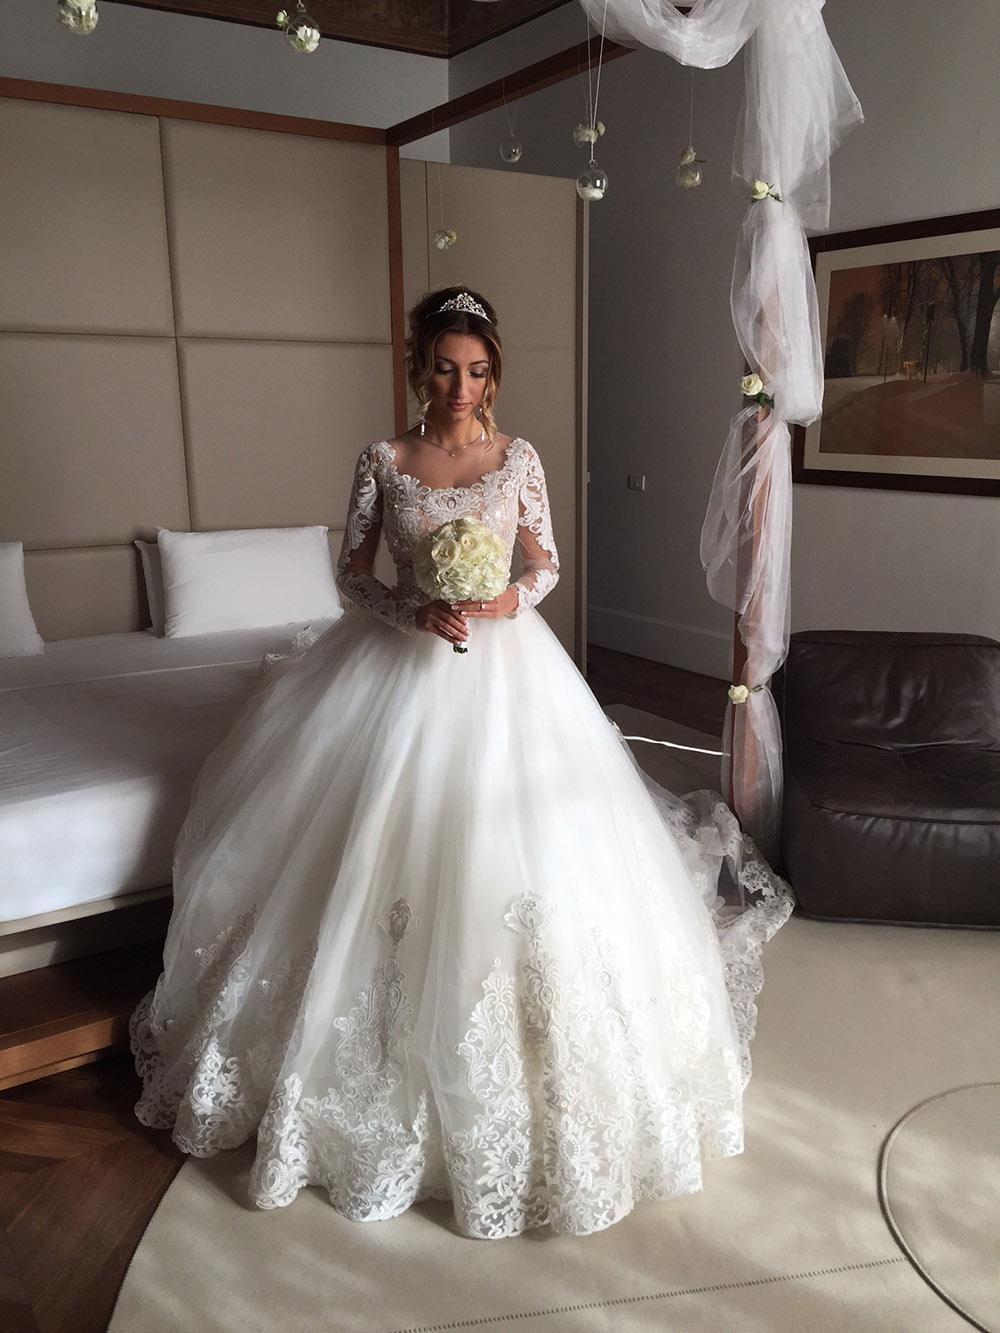 8-armenian-italian-wedding-in-rome-annartstyle-news.JPG